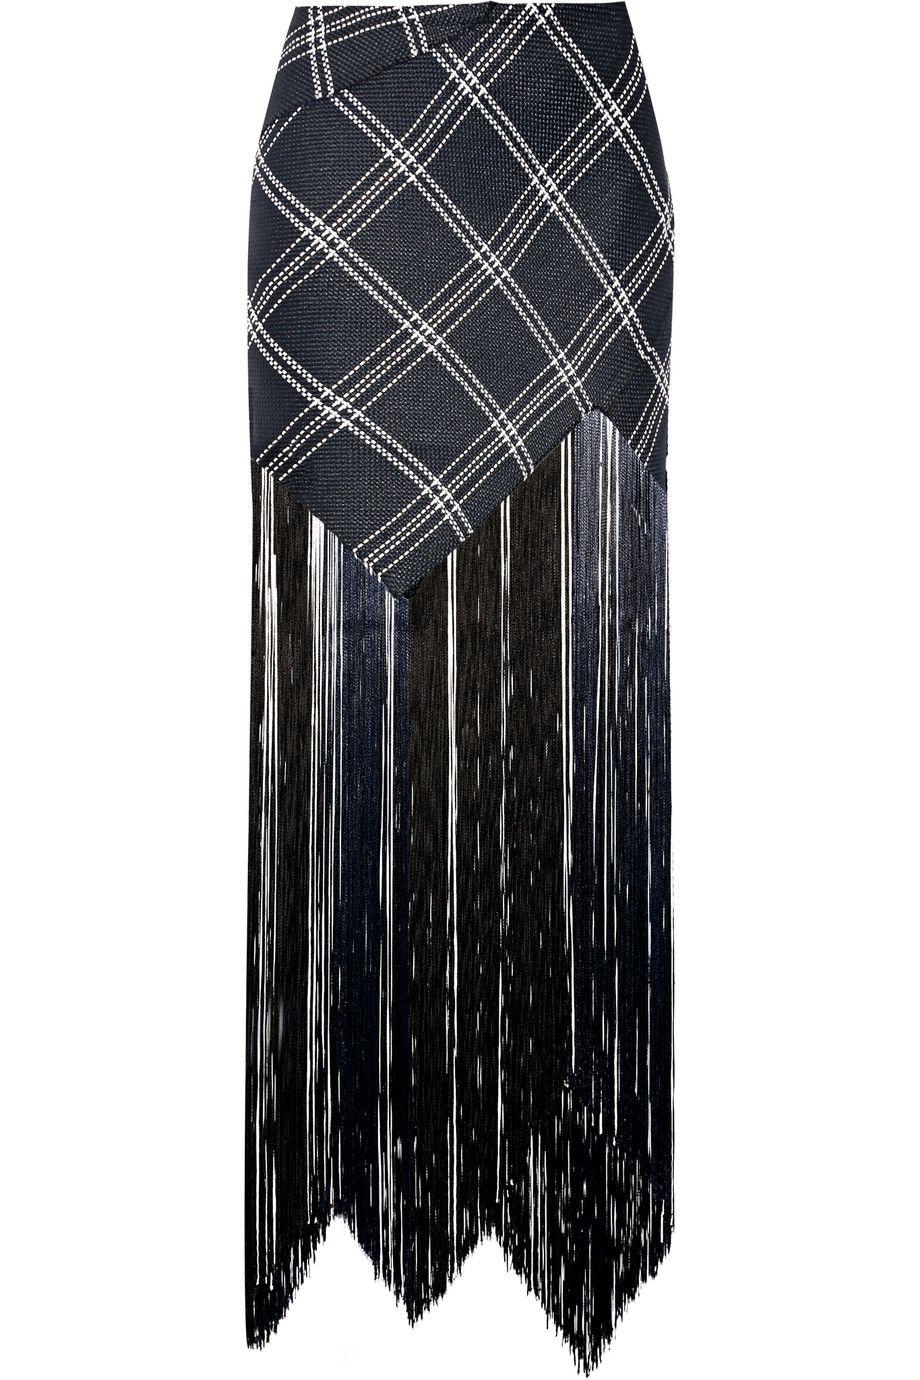 PROENZA SCHOULER Fringed Plaid Basketweave Canvas Maxi Skirt. #proenzaschouler #cloth #skirt